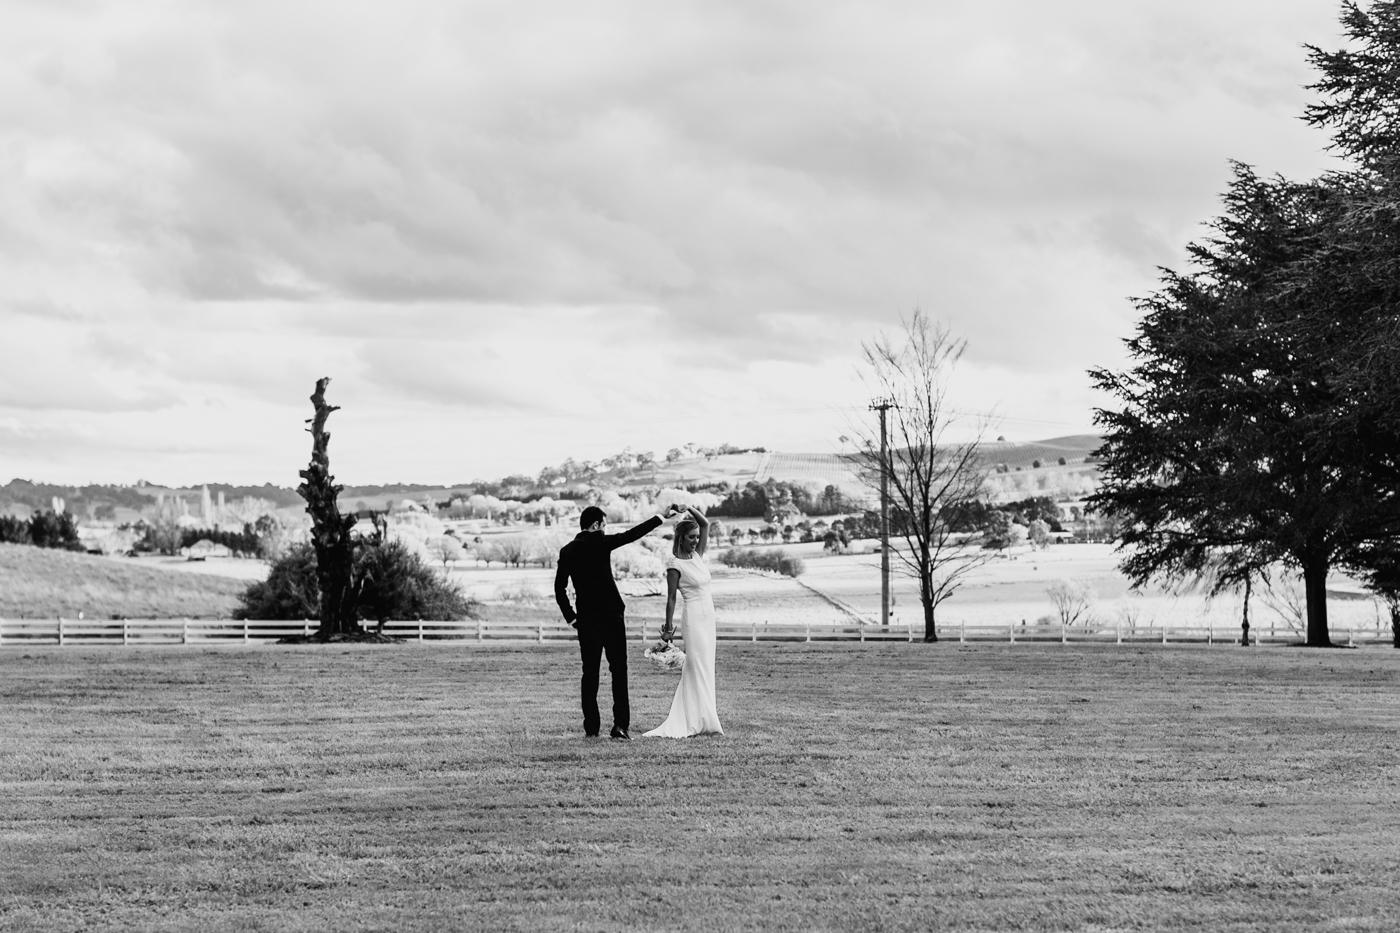 Bridget & James - Orange Country Wedding - Samantha Heather Photography-148.jpg